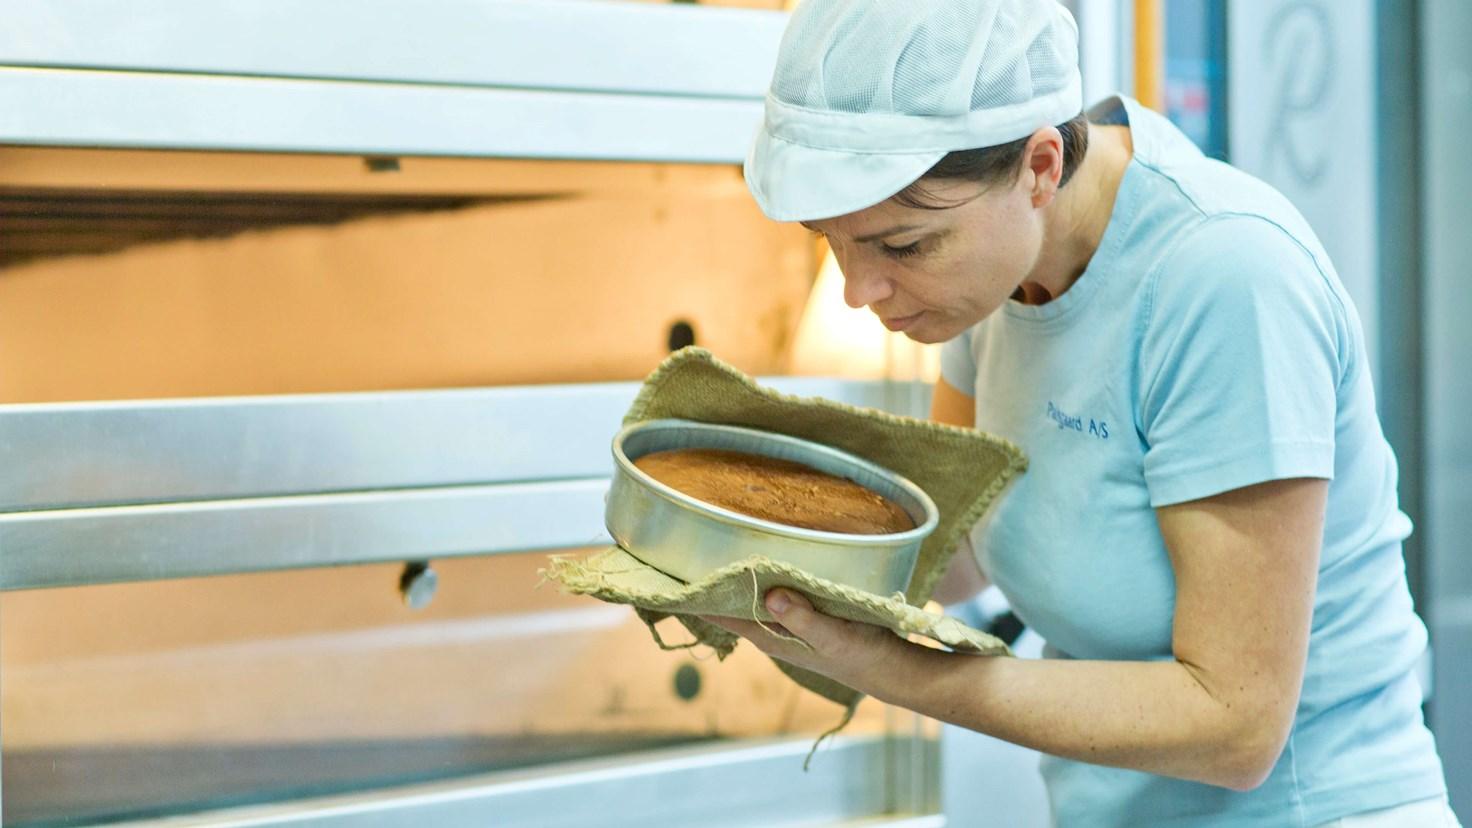 Palsgaard Baker Making A Gluten Free Devil's Food Cake